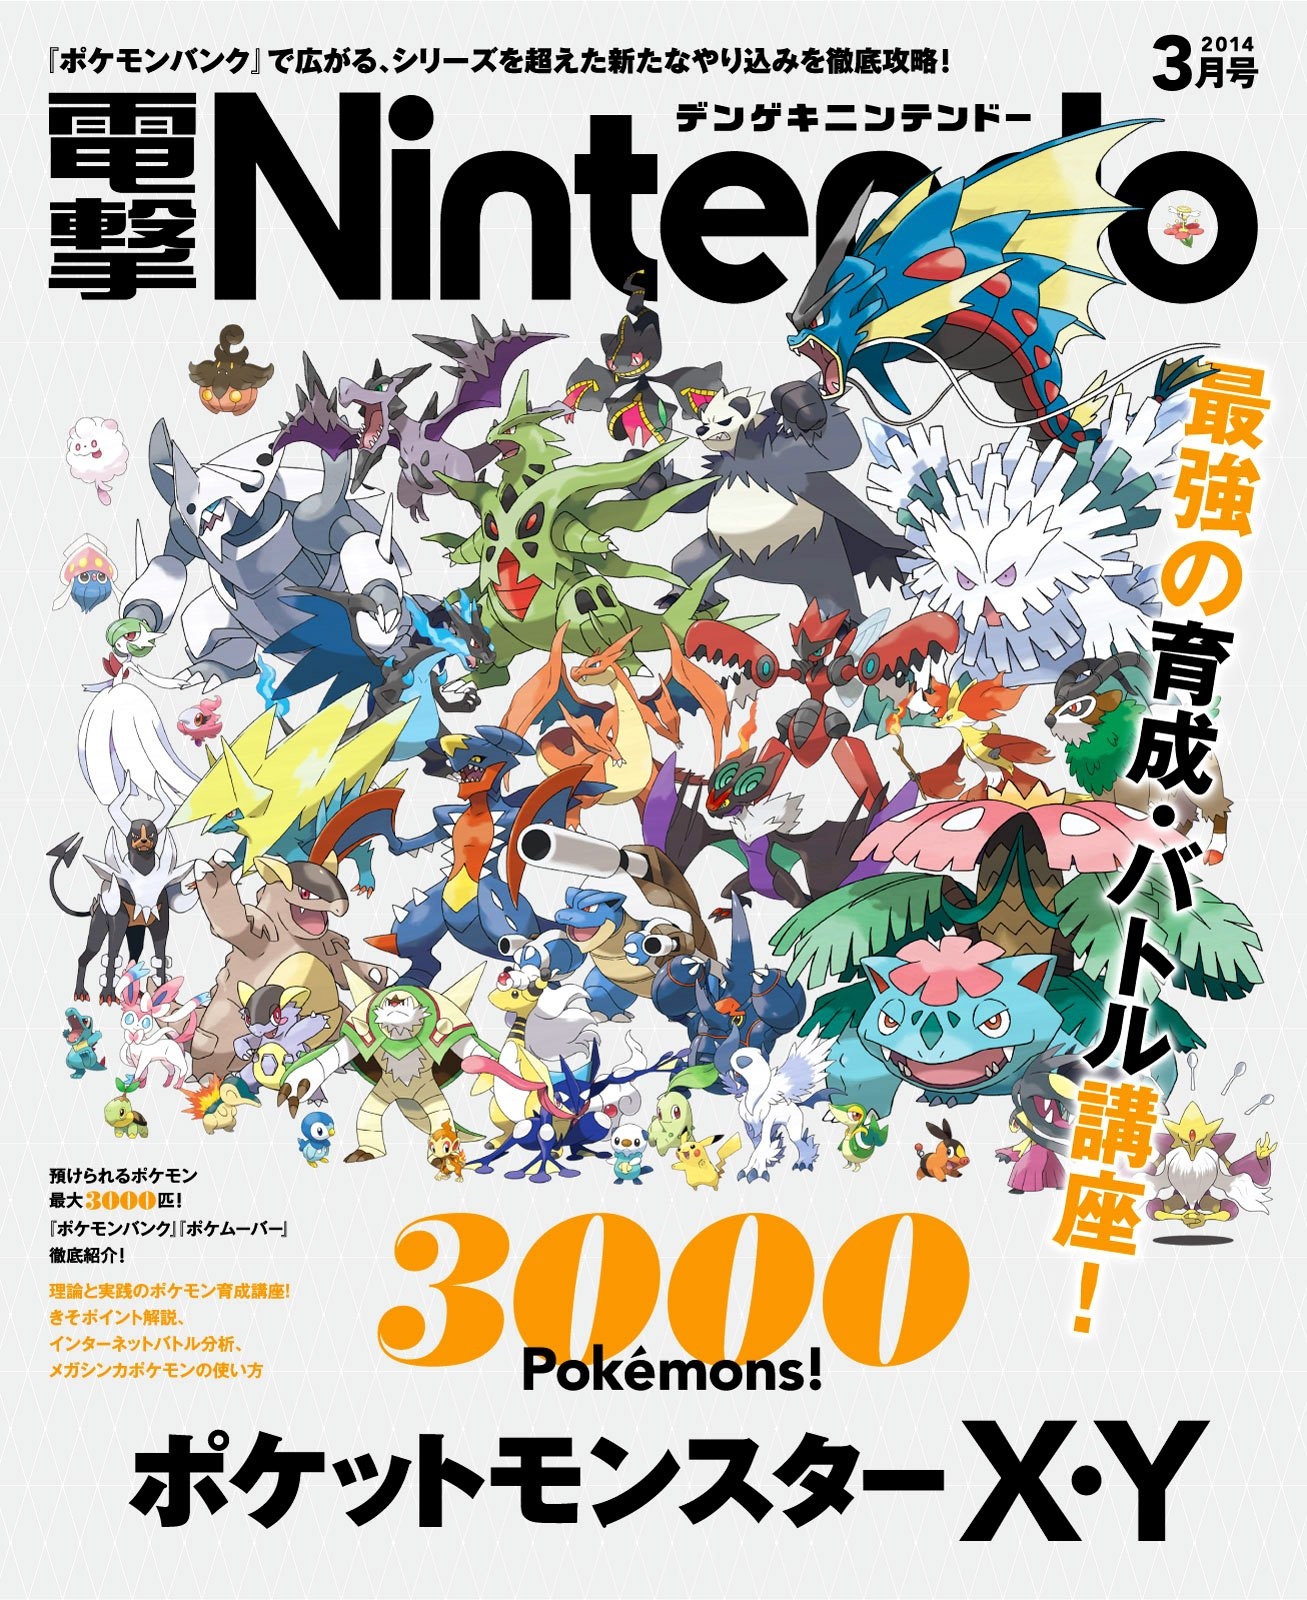 Dengeki Nintendo Issue 010 (March 2014)